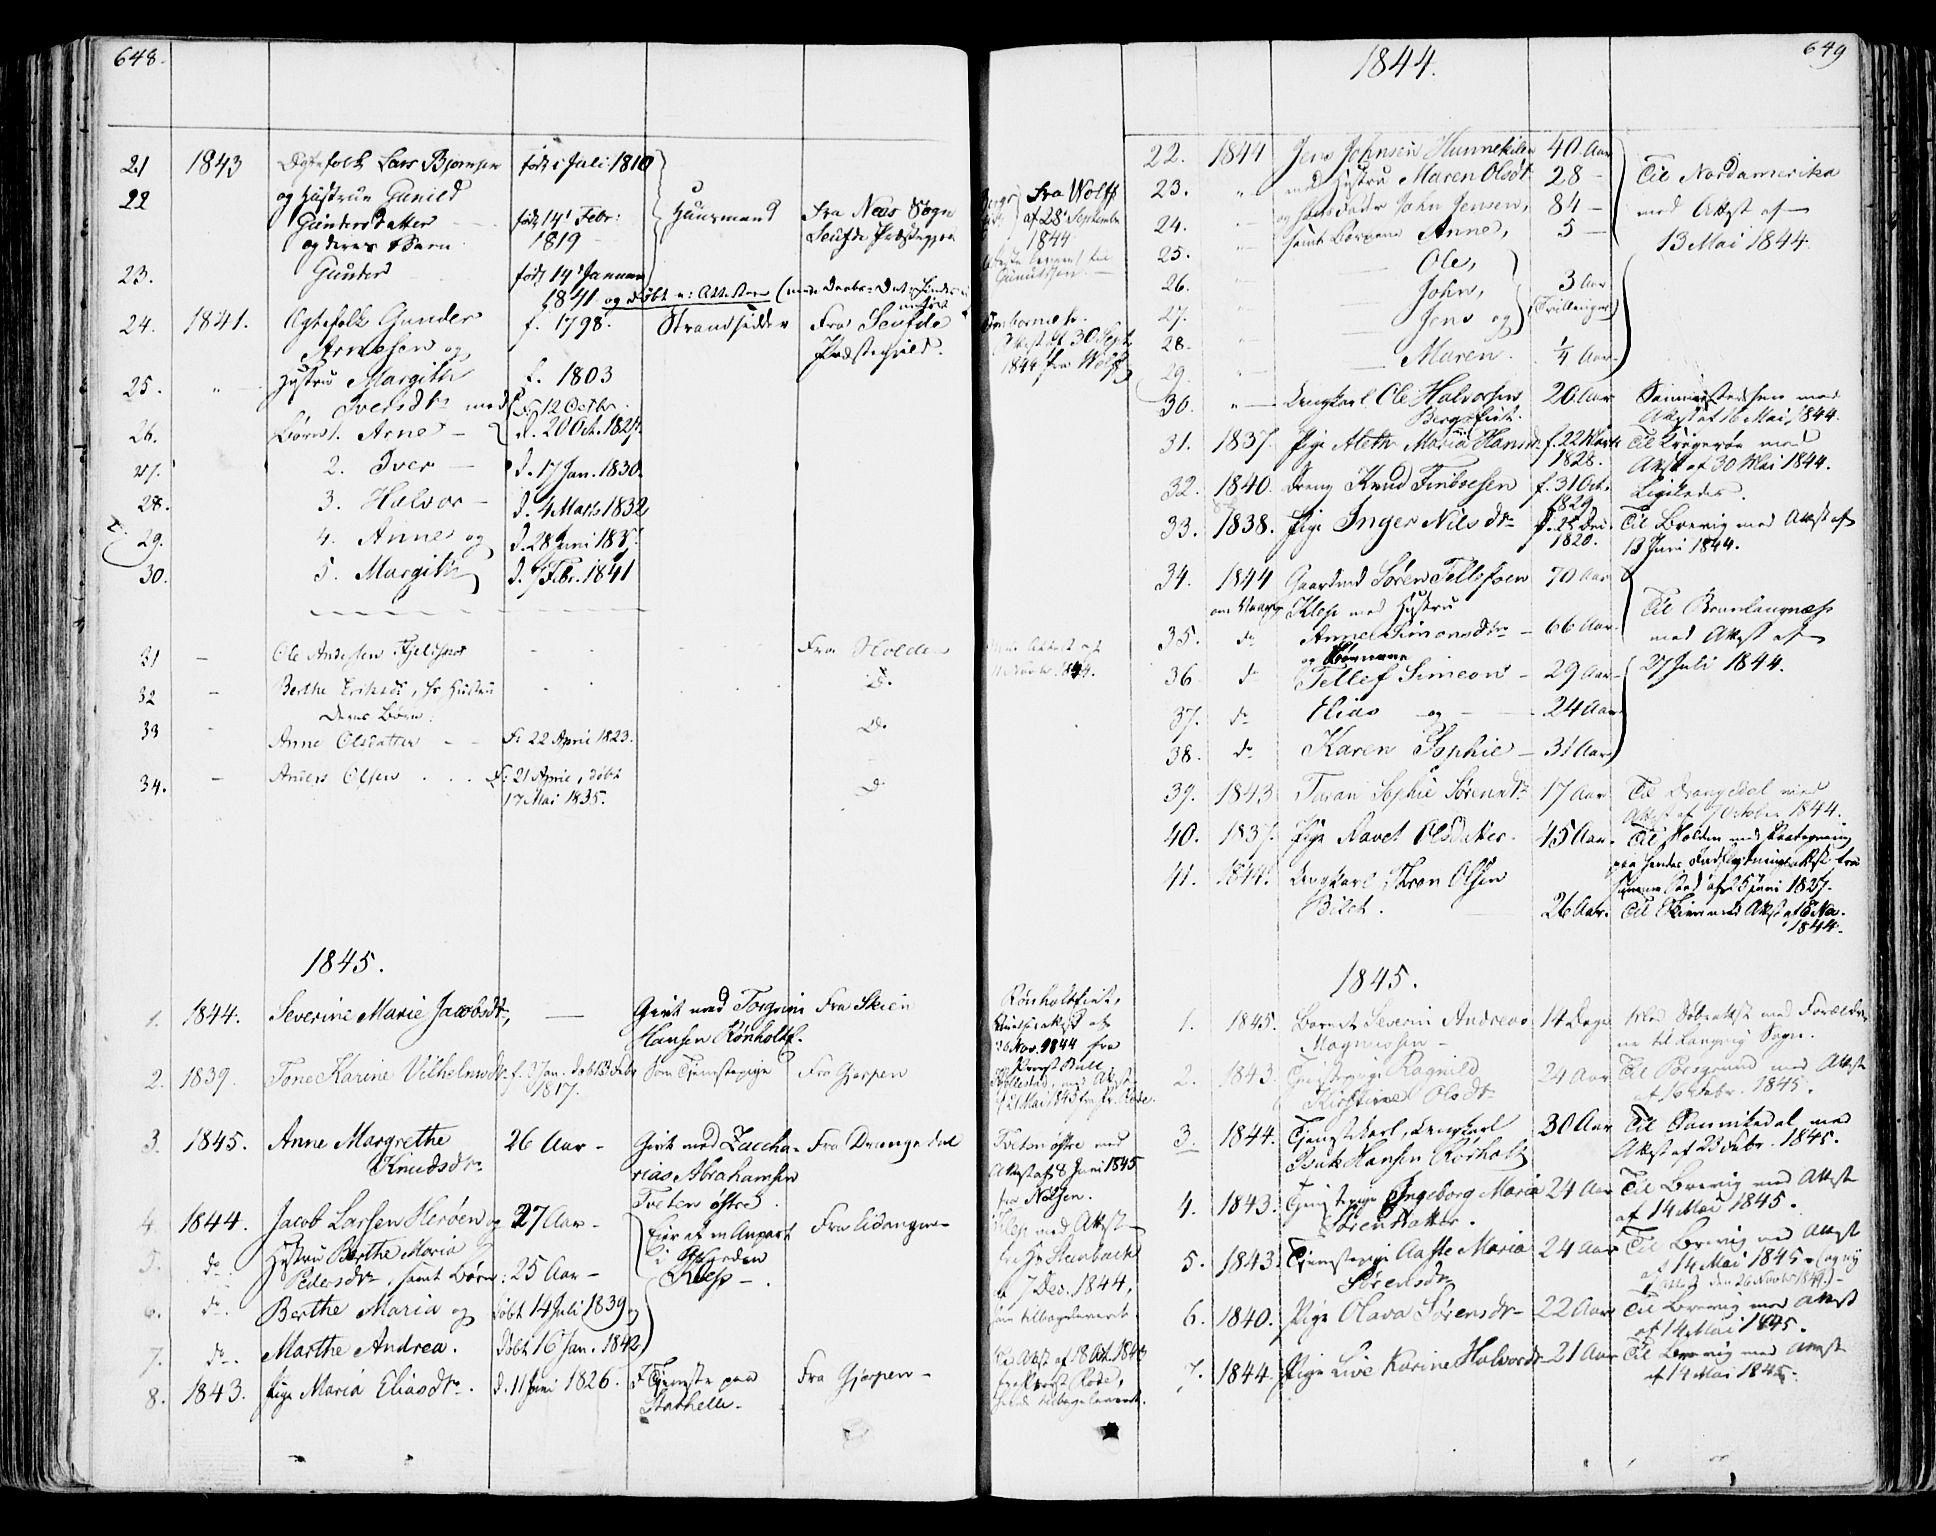 SAKO, Bamble kirkebøker, F/Fa/L0004: Ministerialbok nr. I 4, 1834-1853, s. 648-649